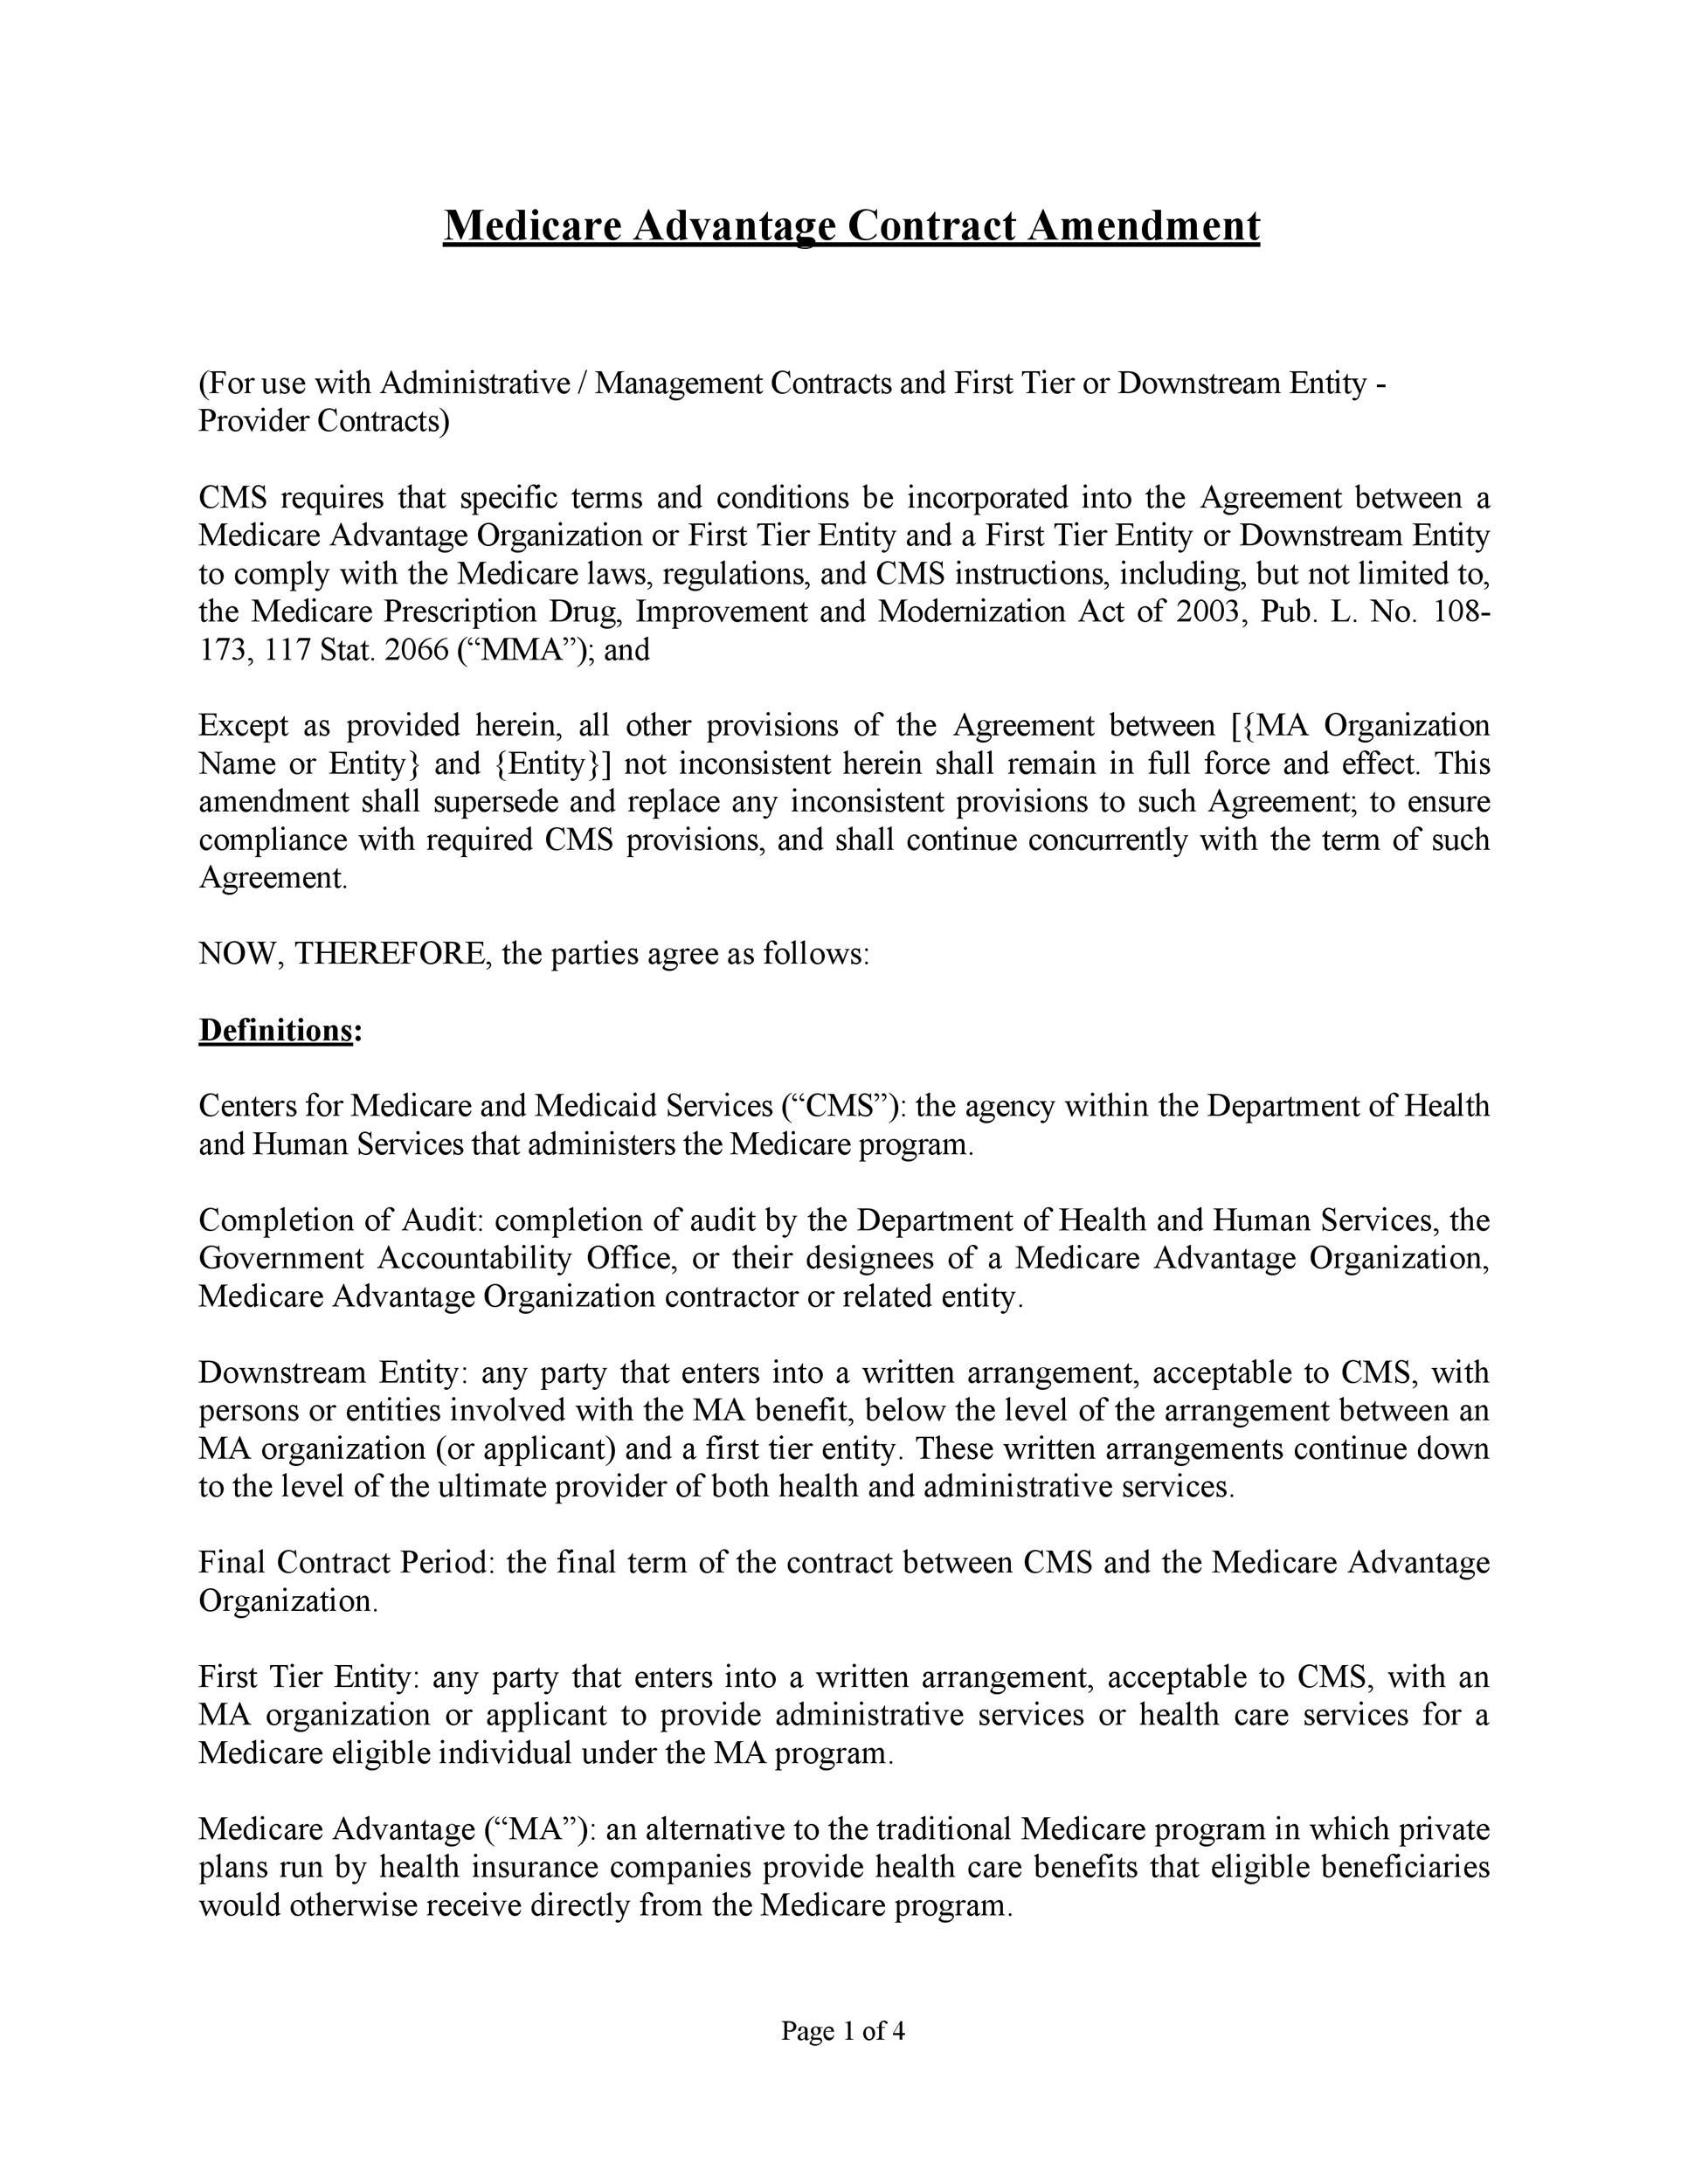 Free contract amendment 20